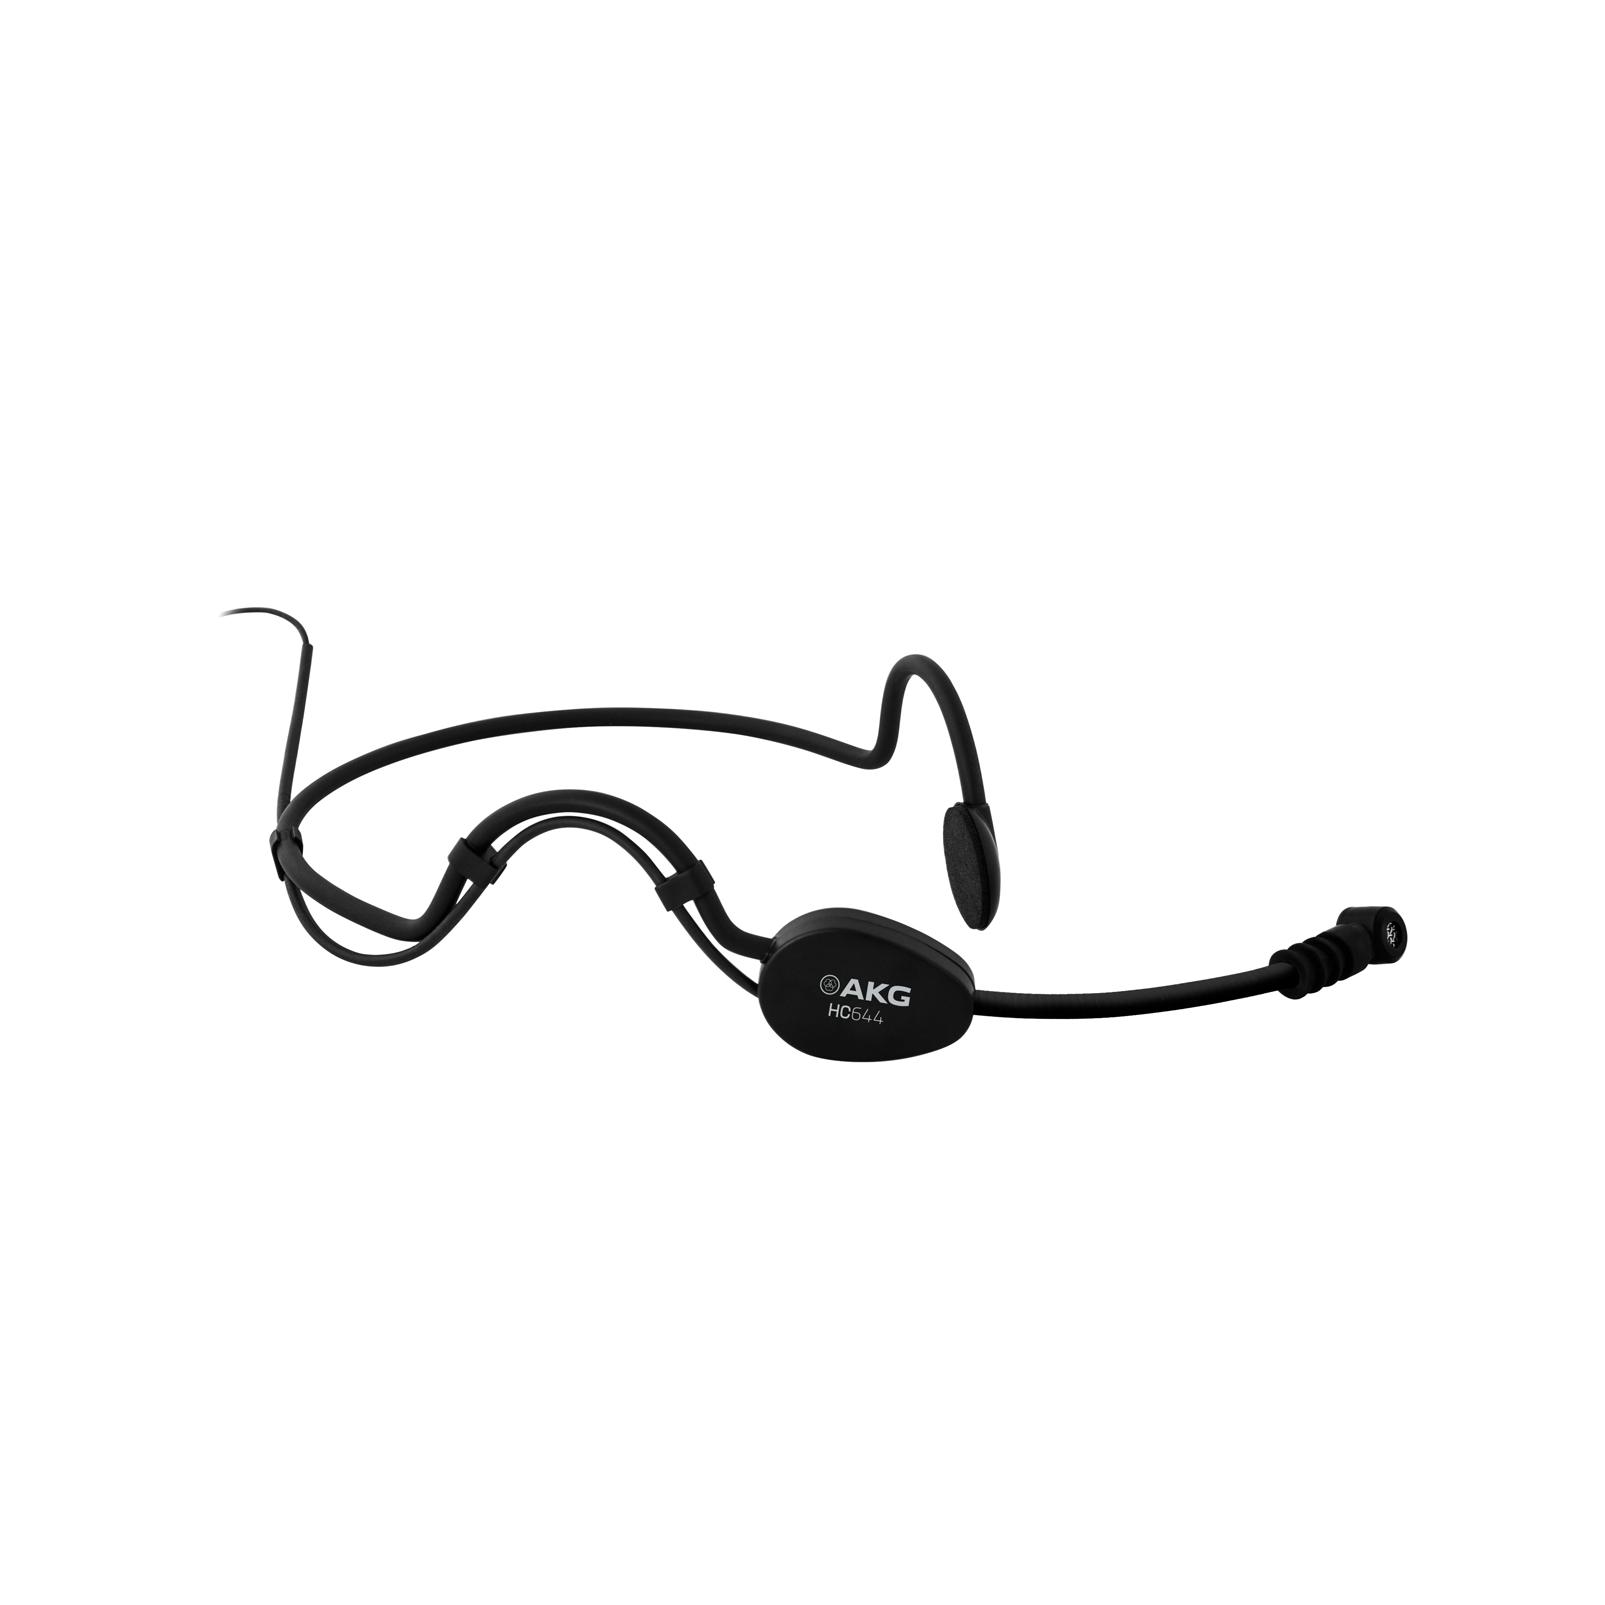 HC644 MD - Black - Head-worn microphone - Hero